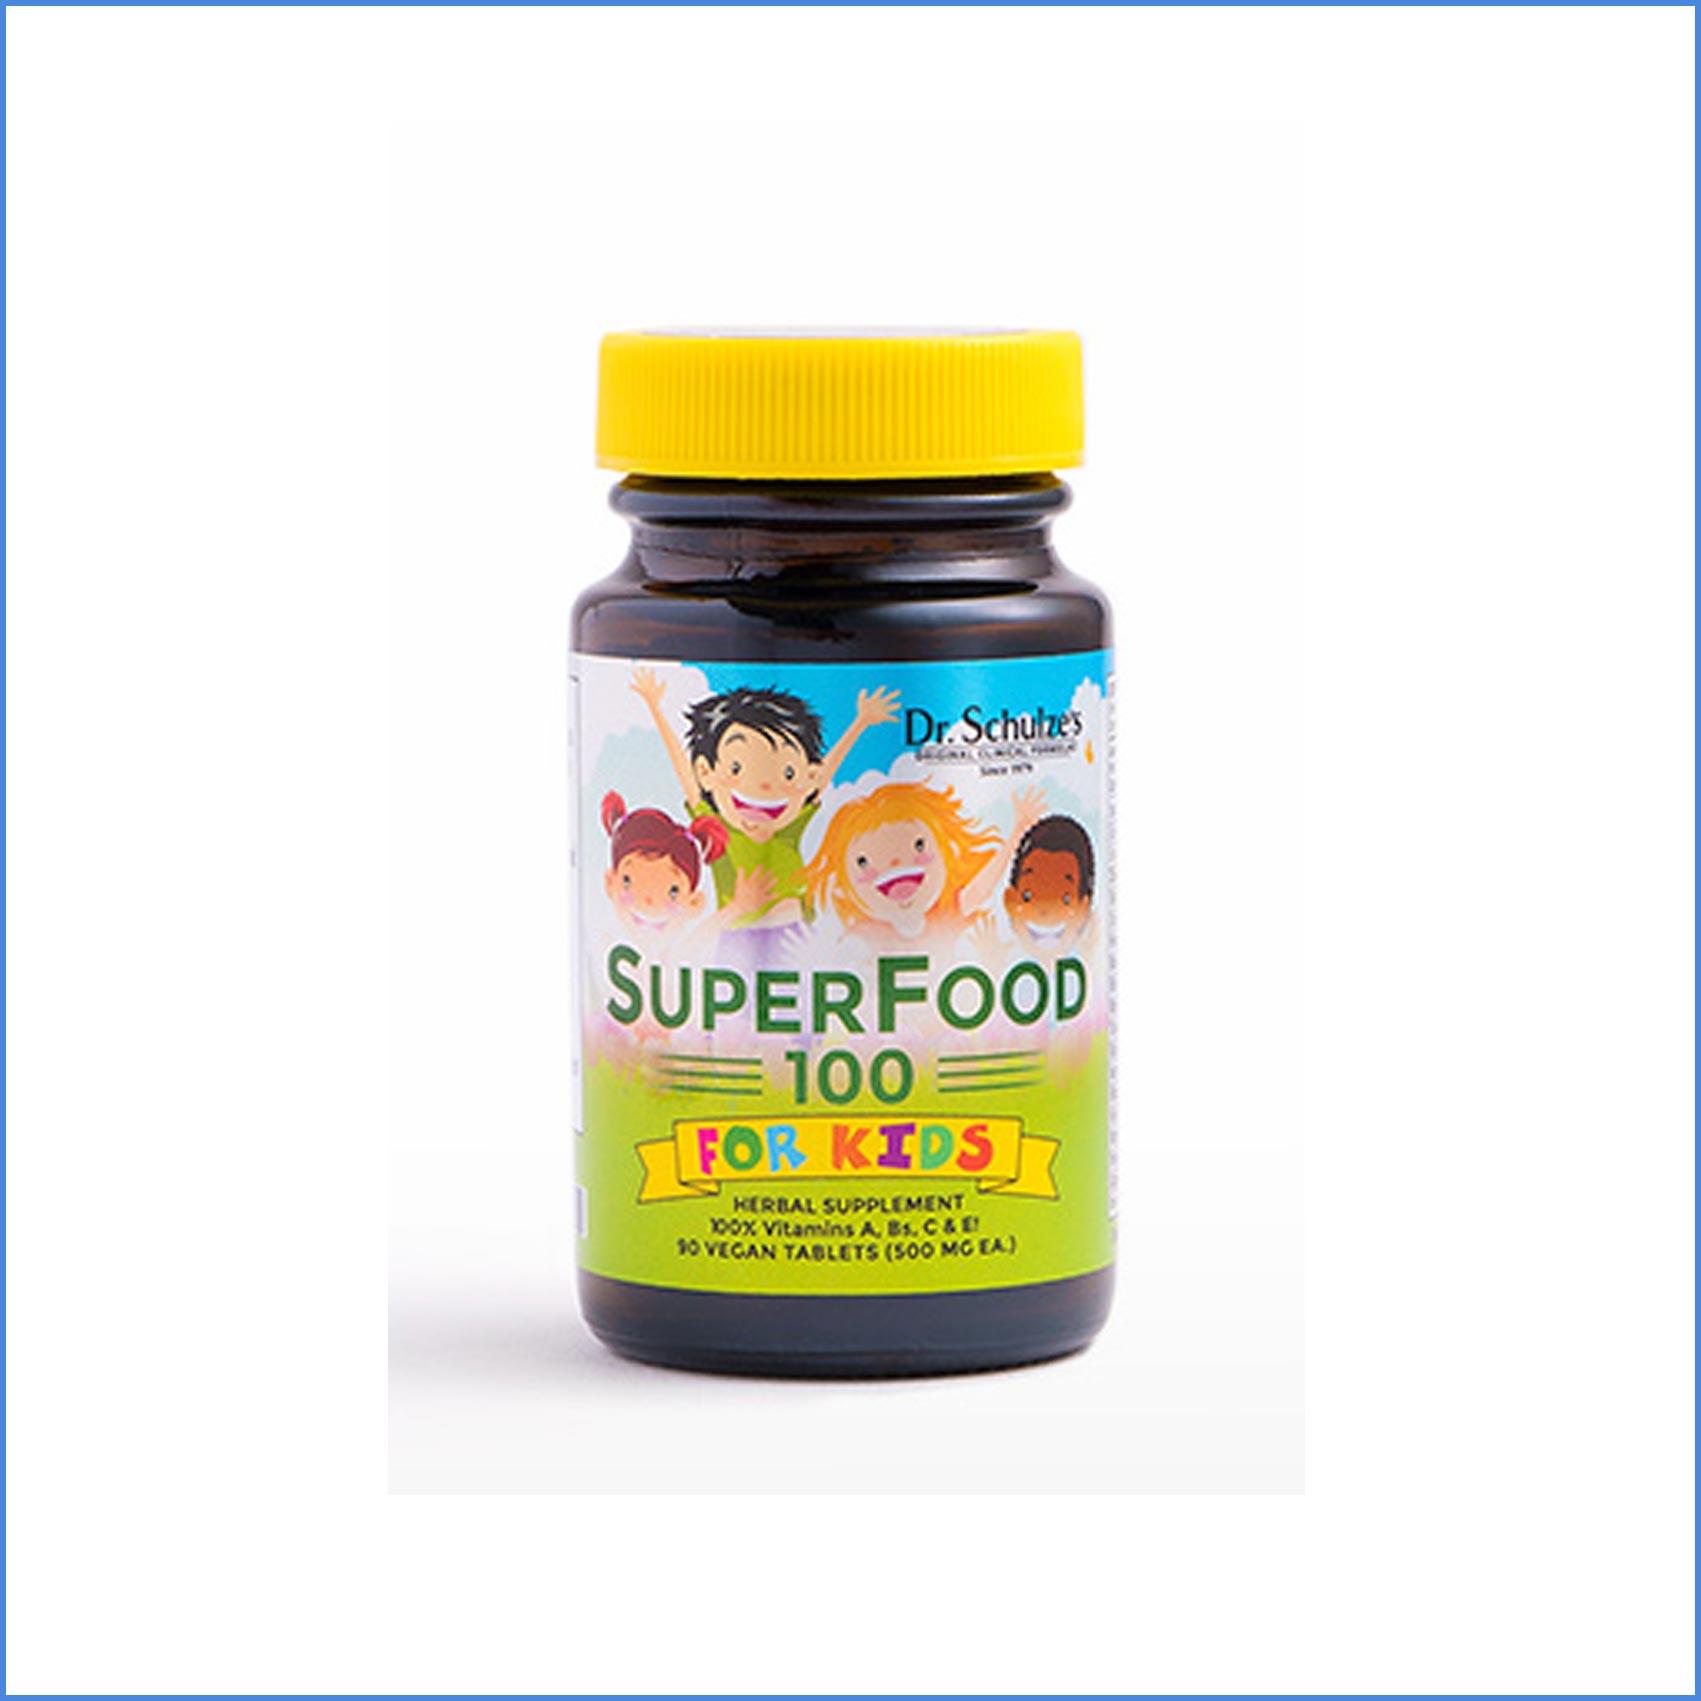 Dr Schulze Superfood for Kids